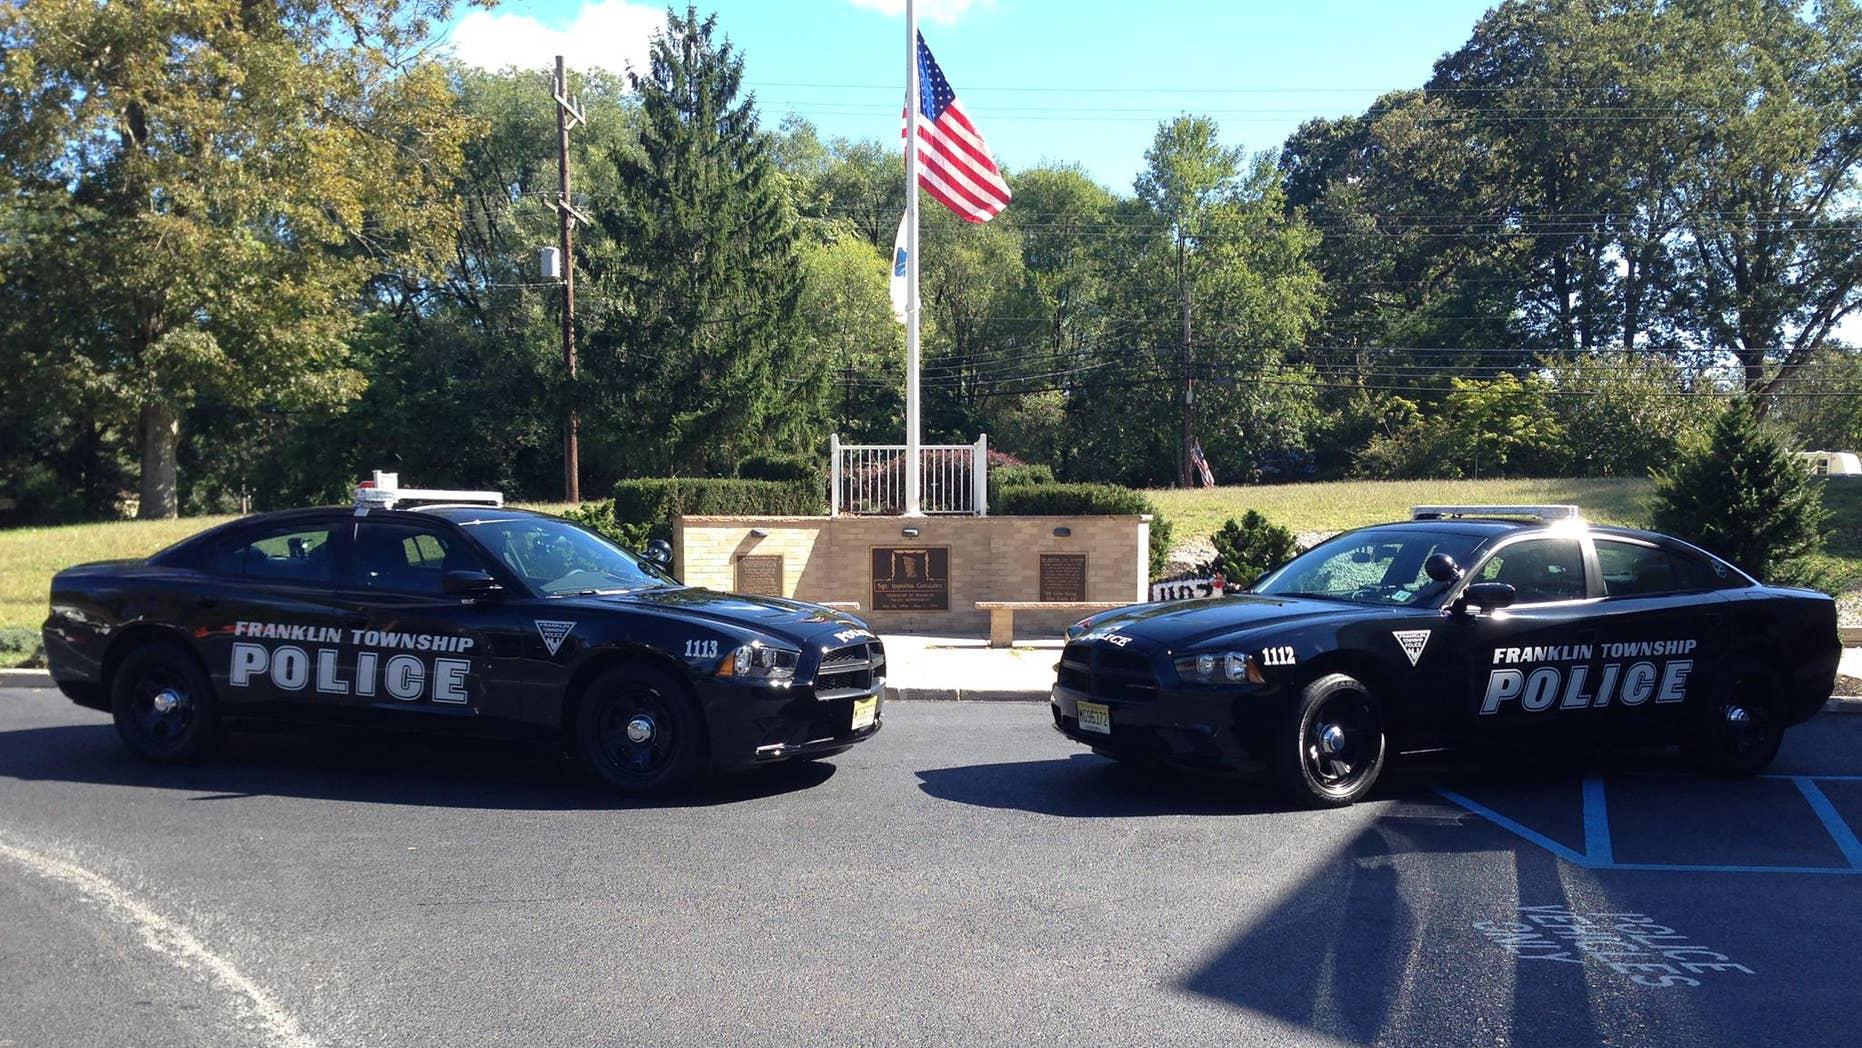 New Jersey police capture alleged serial diaper dumper – Trending Stuff